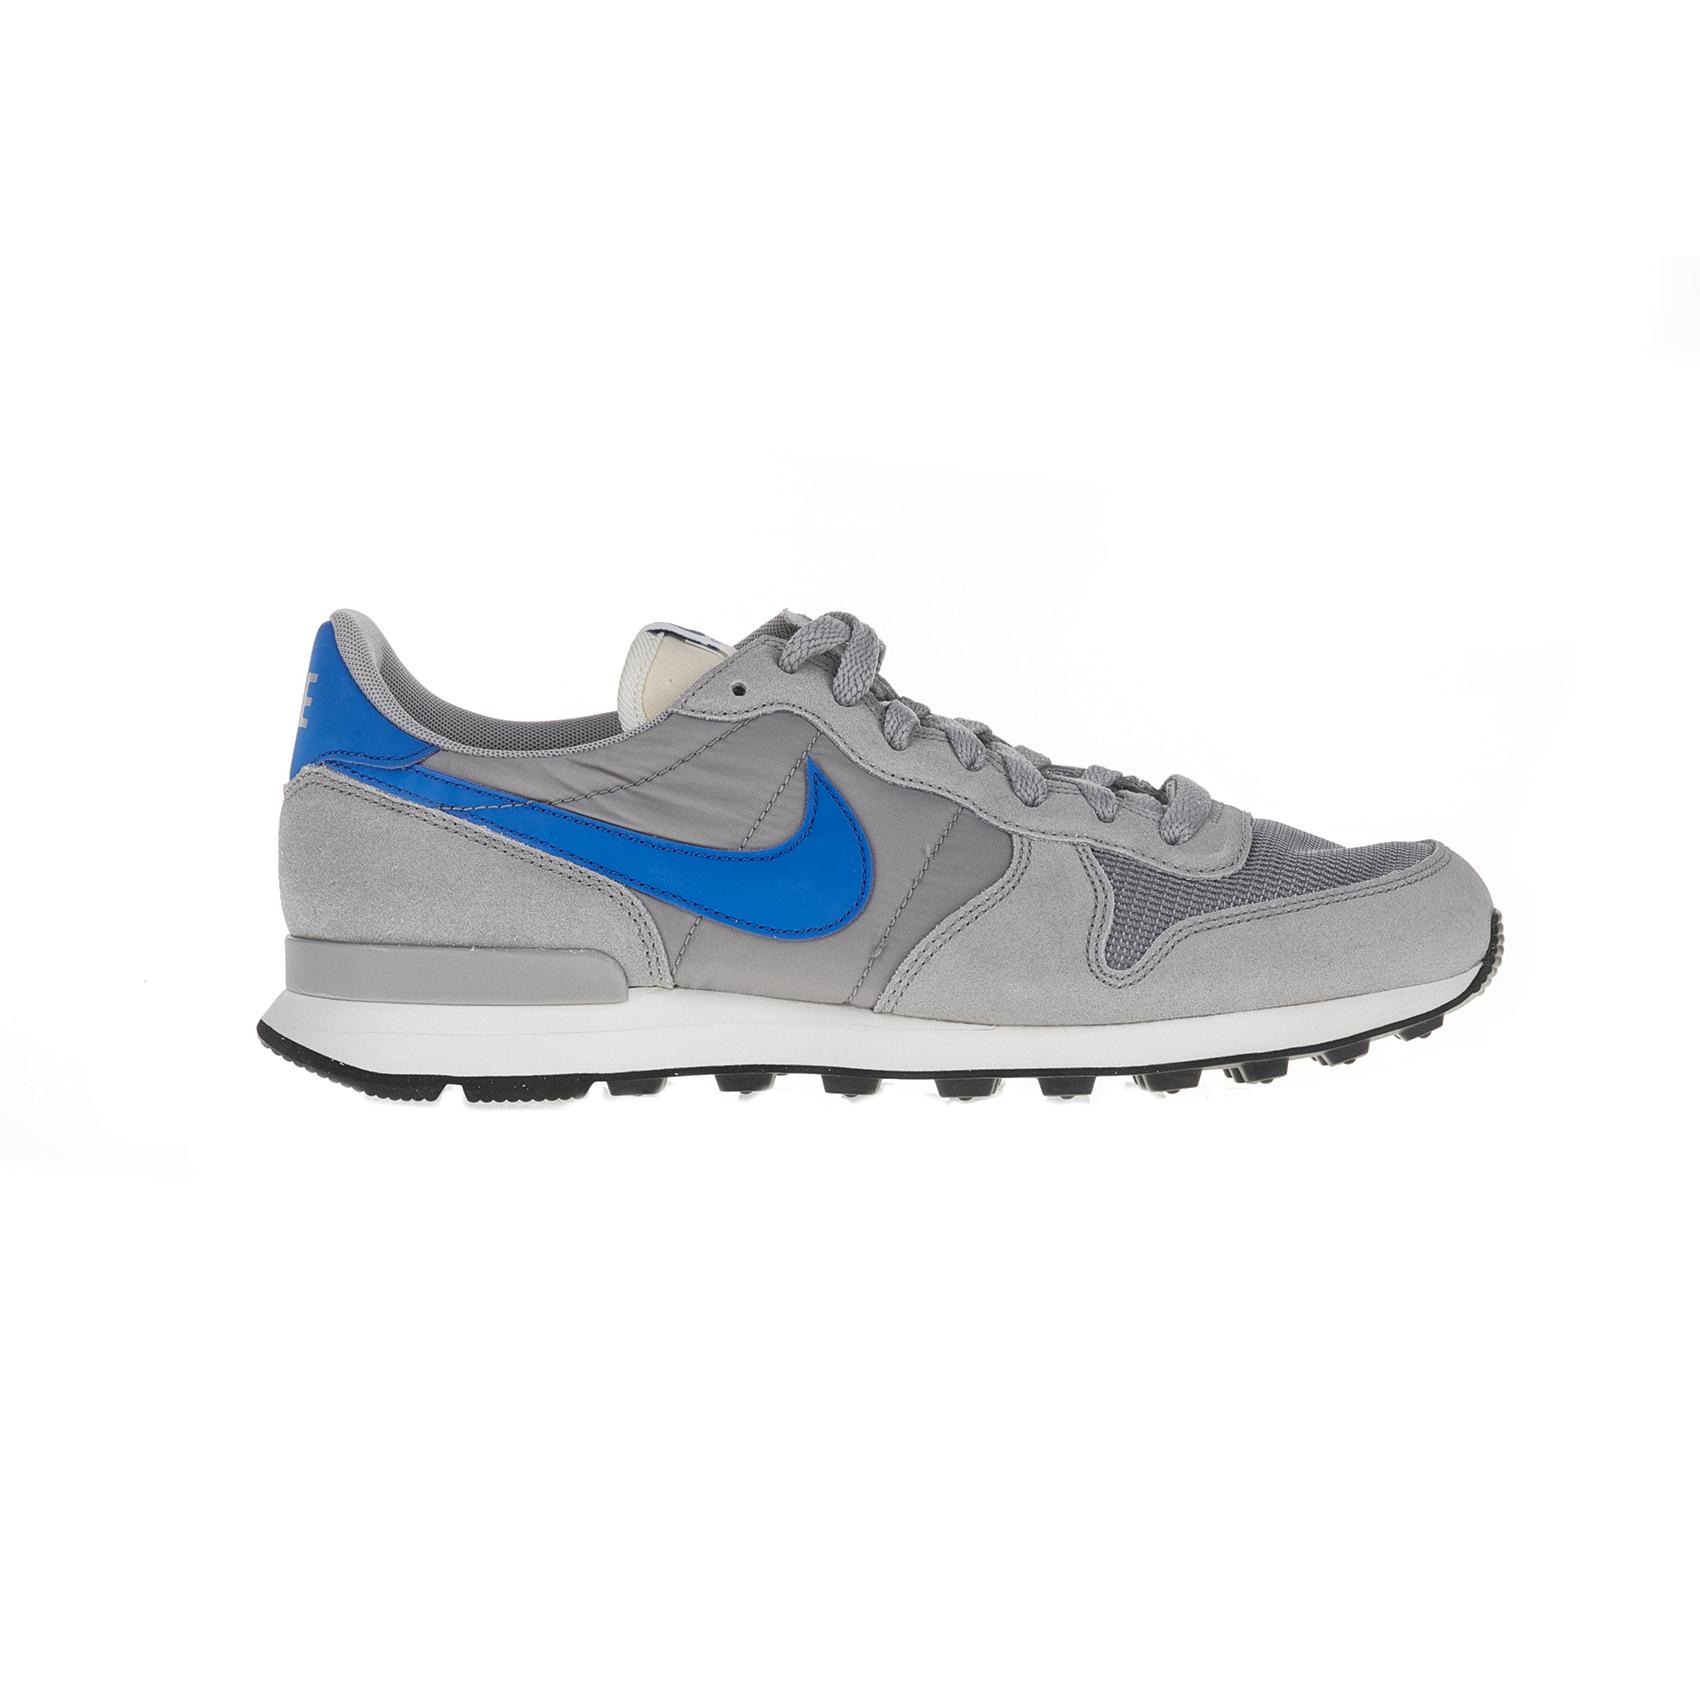 NIKE – Ανδρικά παπούτσια NIKE INTERNATIONALIST γκρι-μπλε